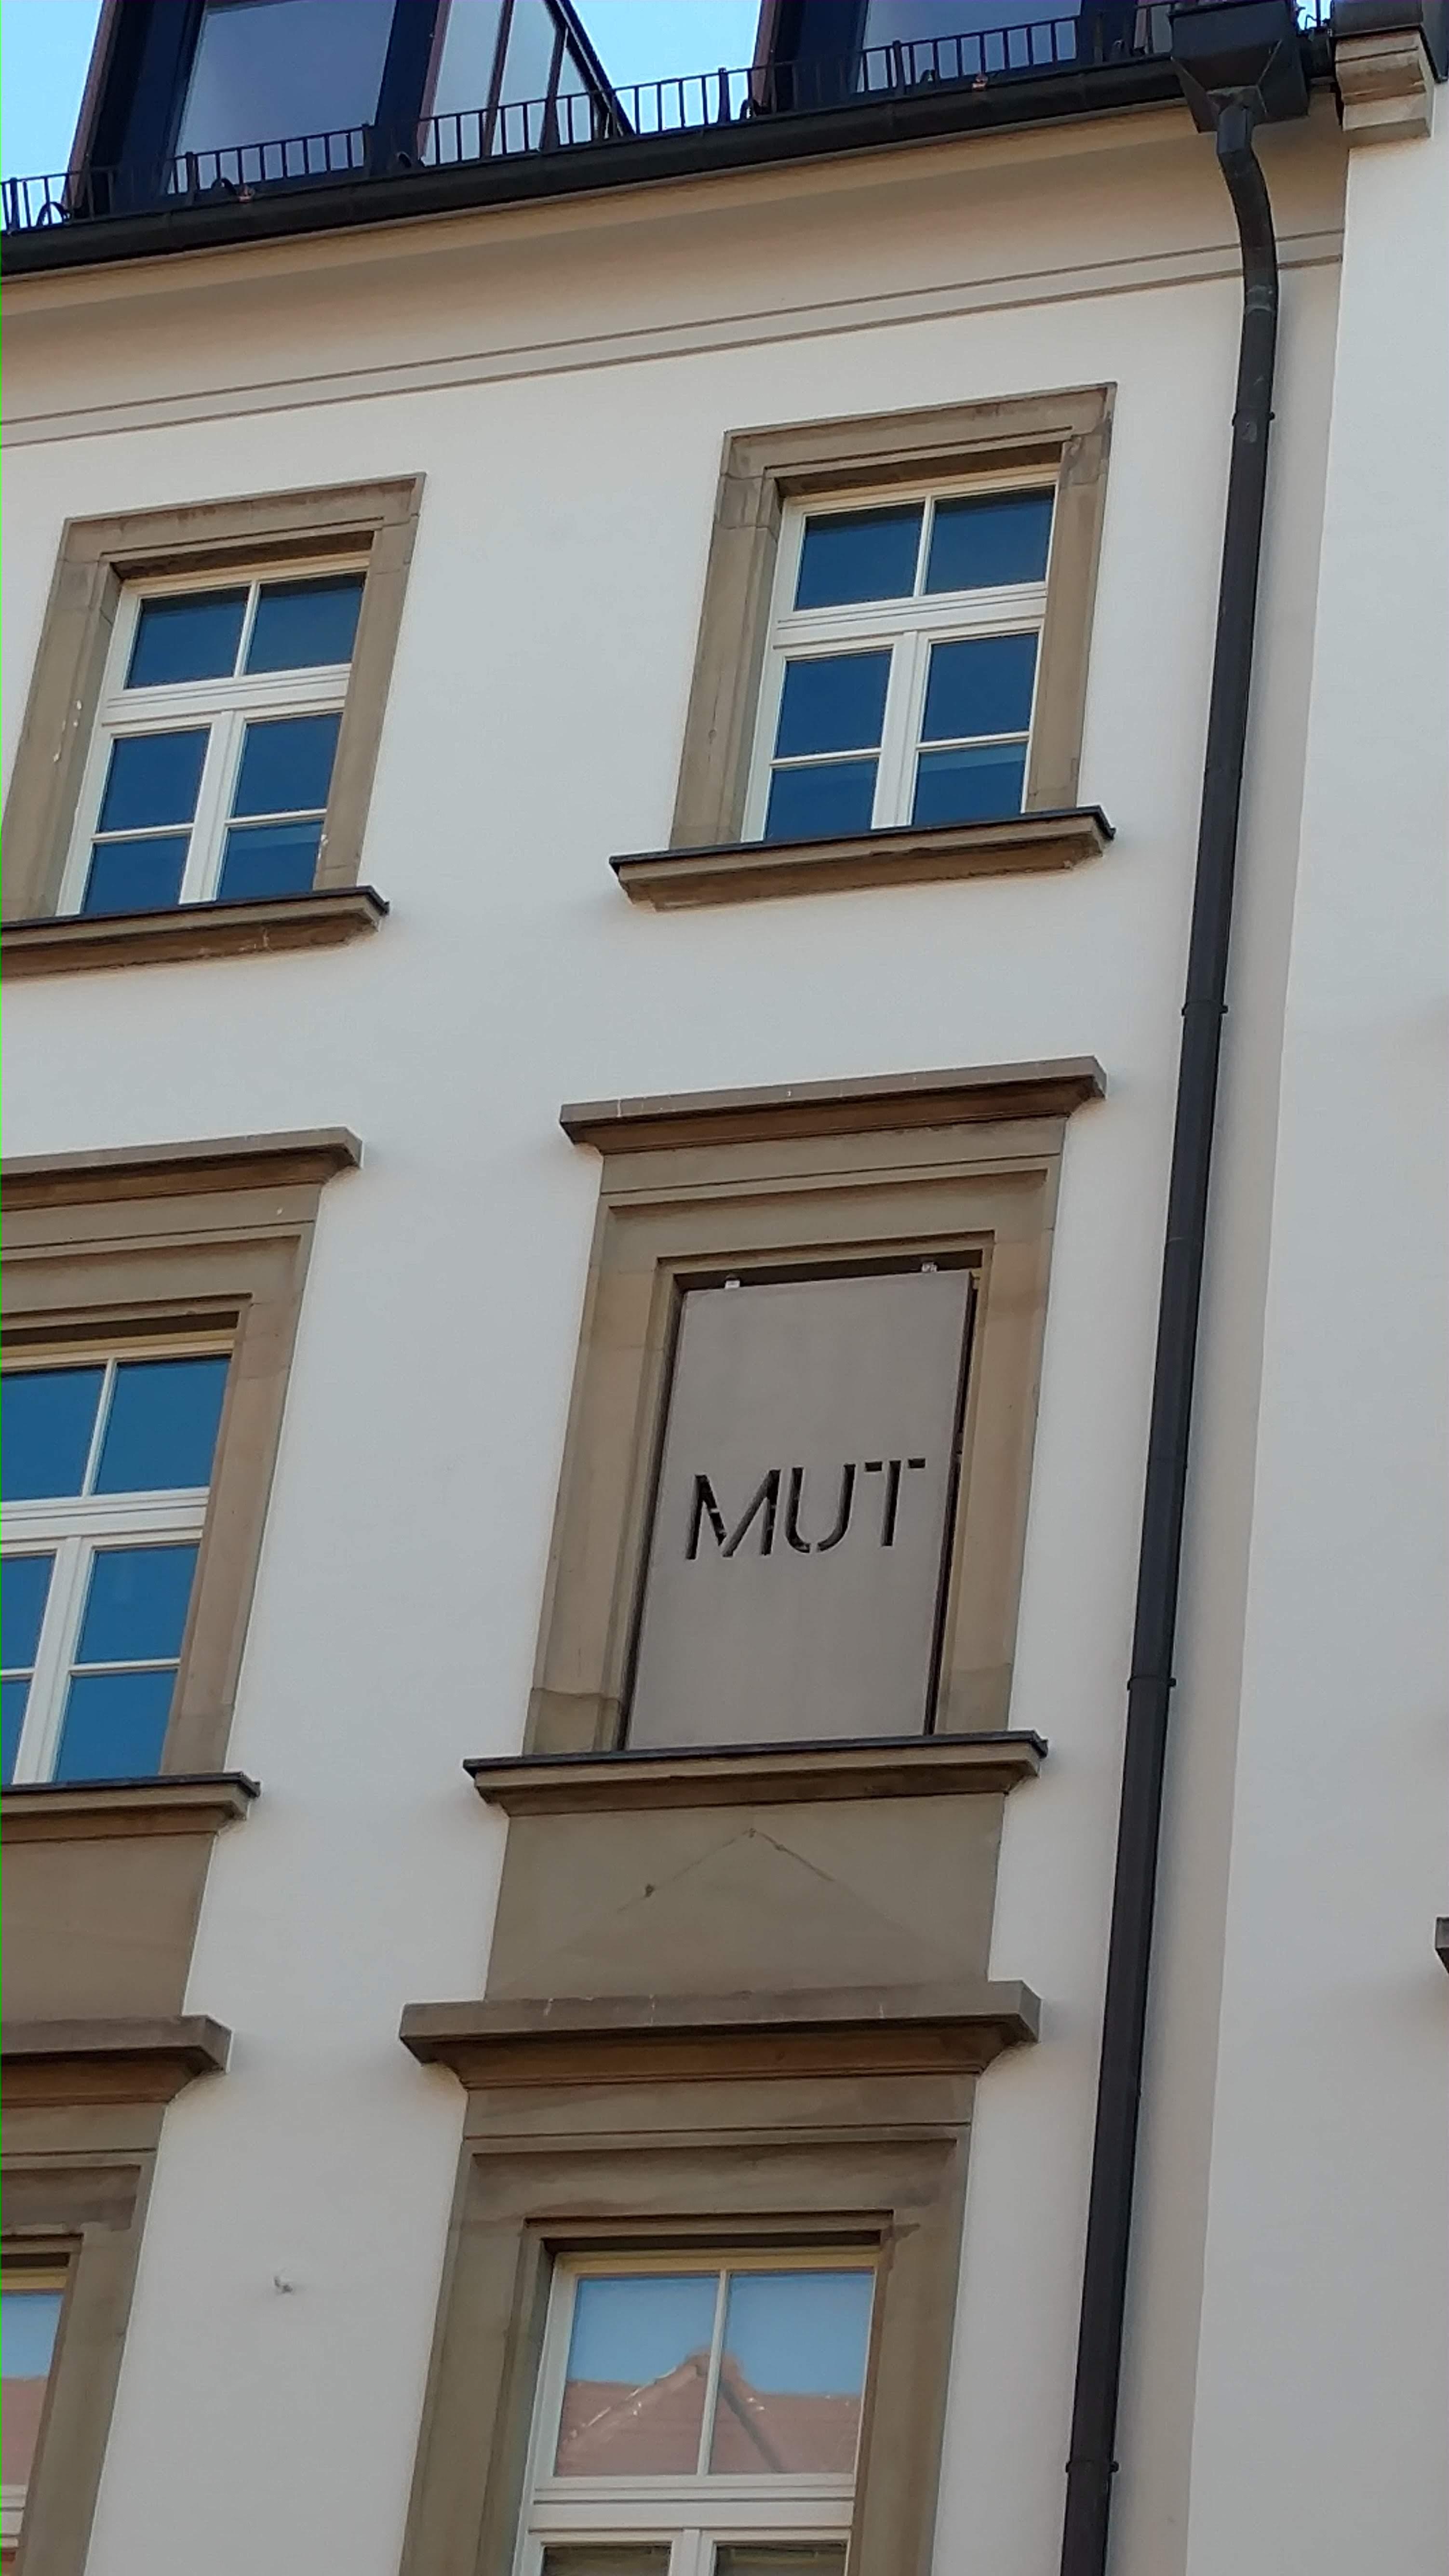 Mut-Hotel-Silber-CSD-2019